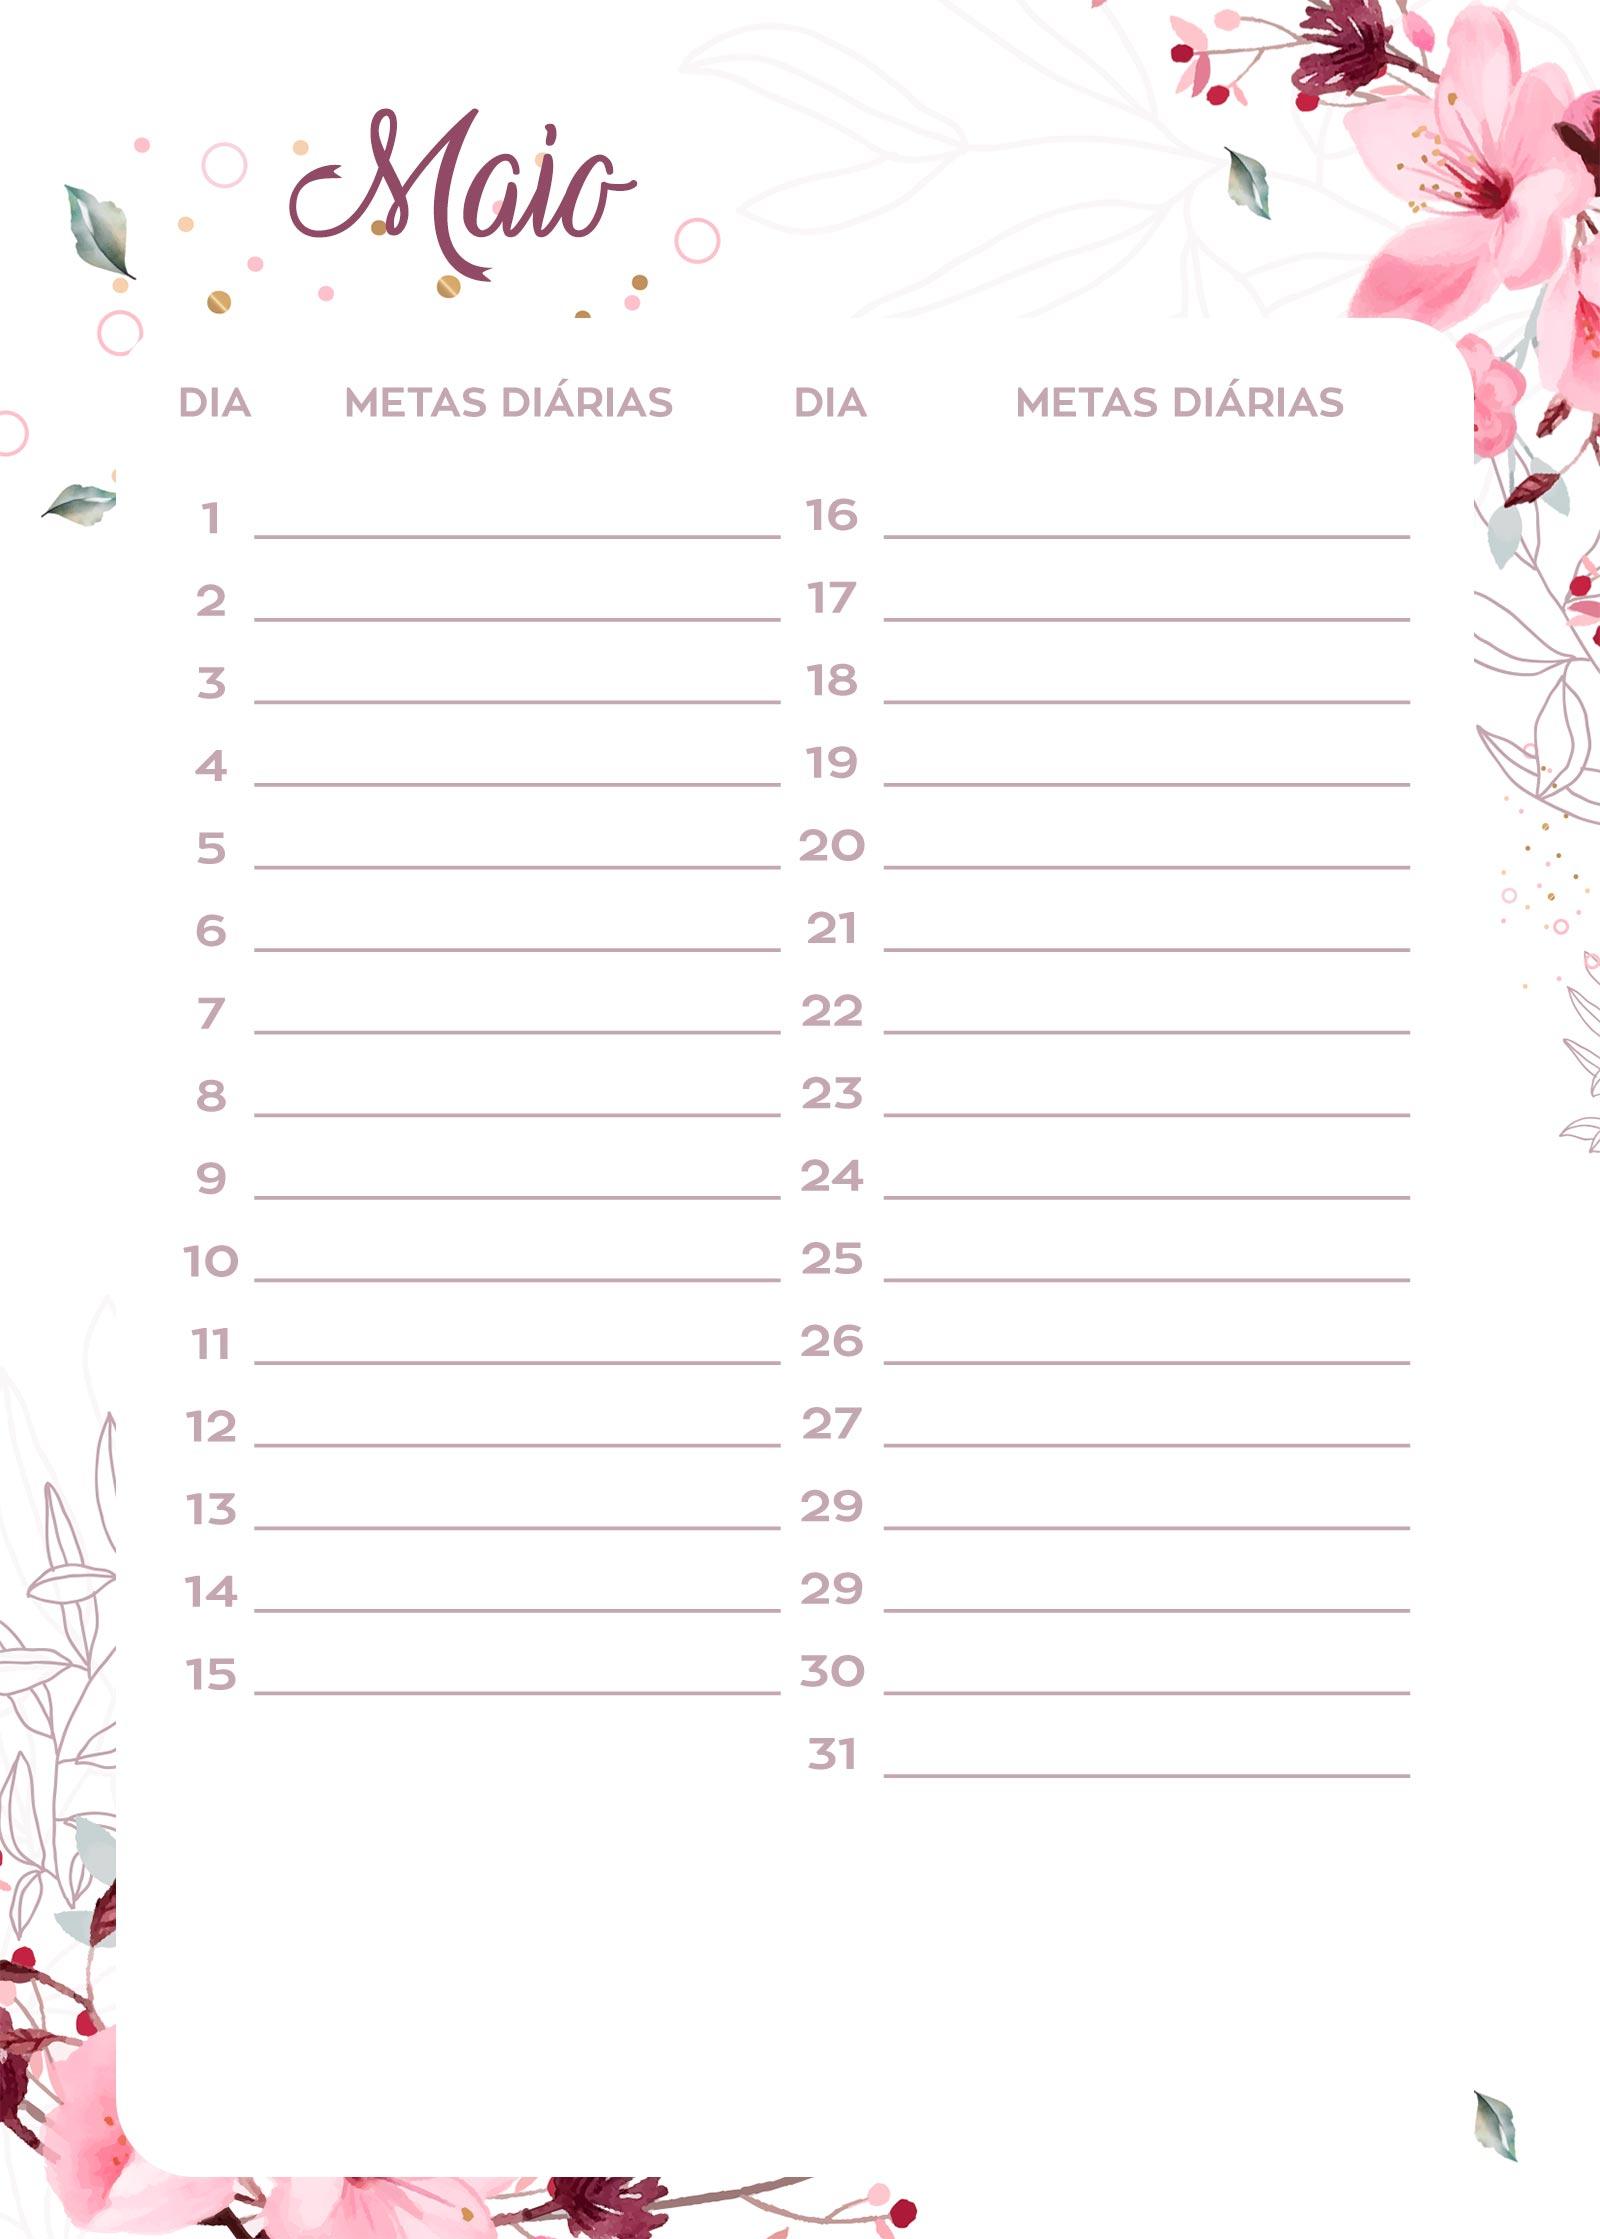 Planner Floral metas diarias maio